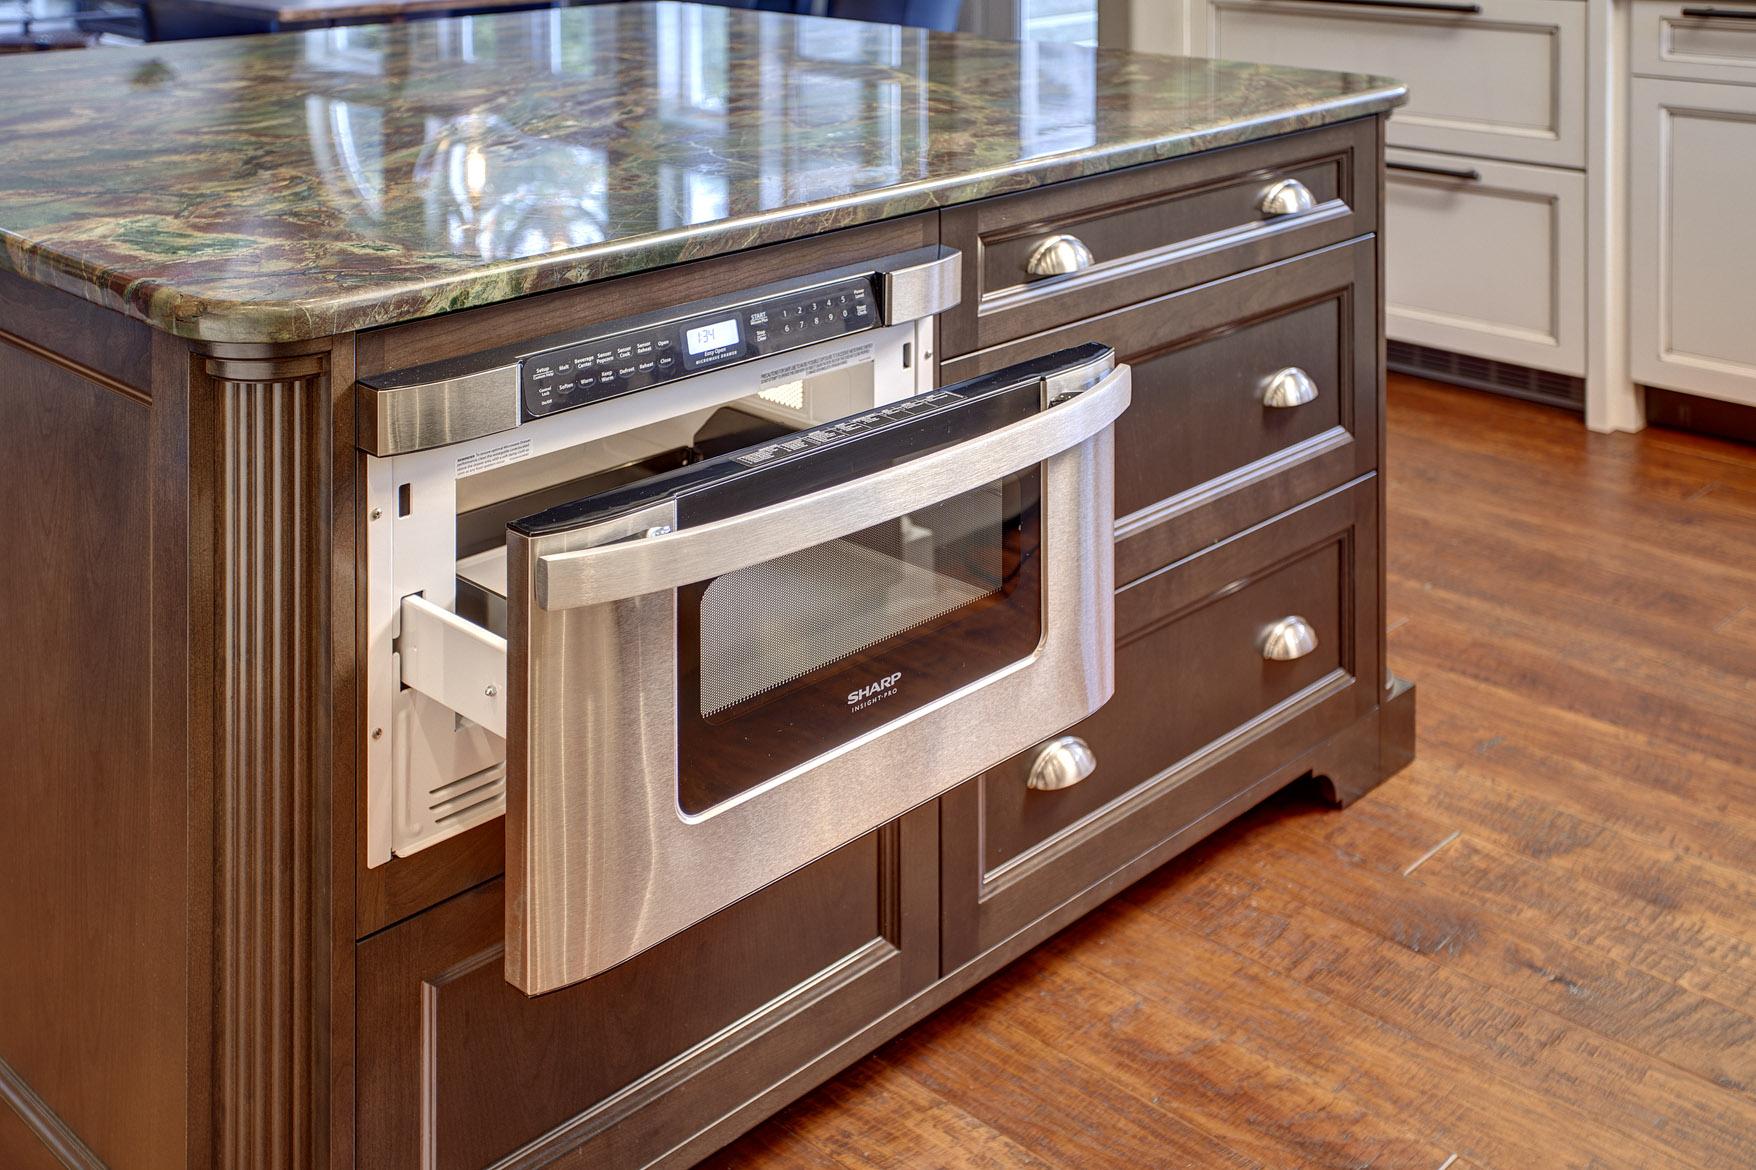 custom appliances create a space you can use